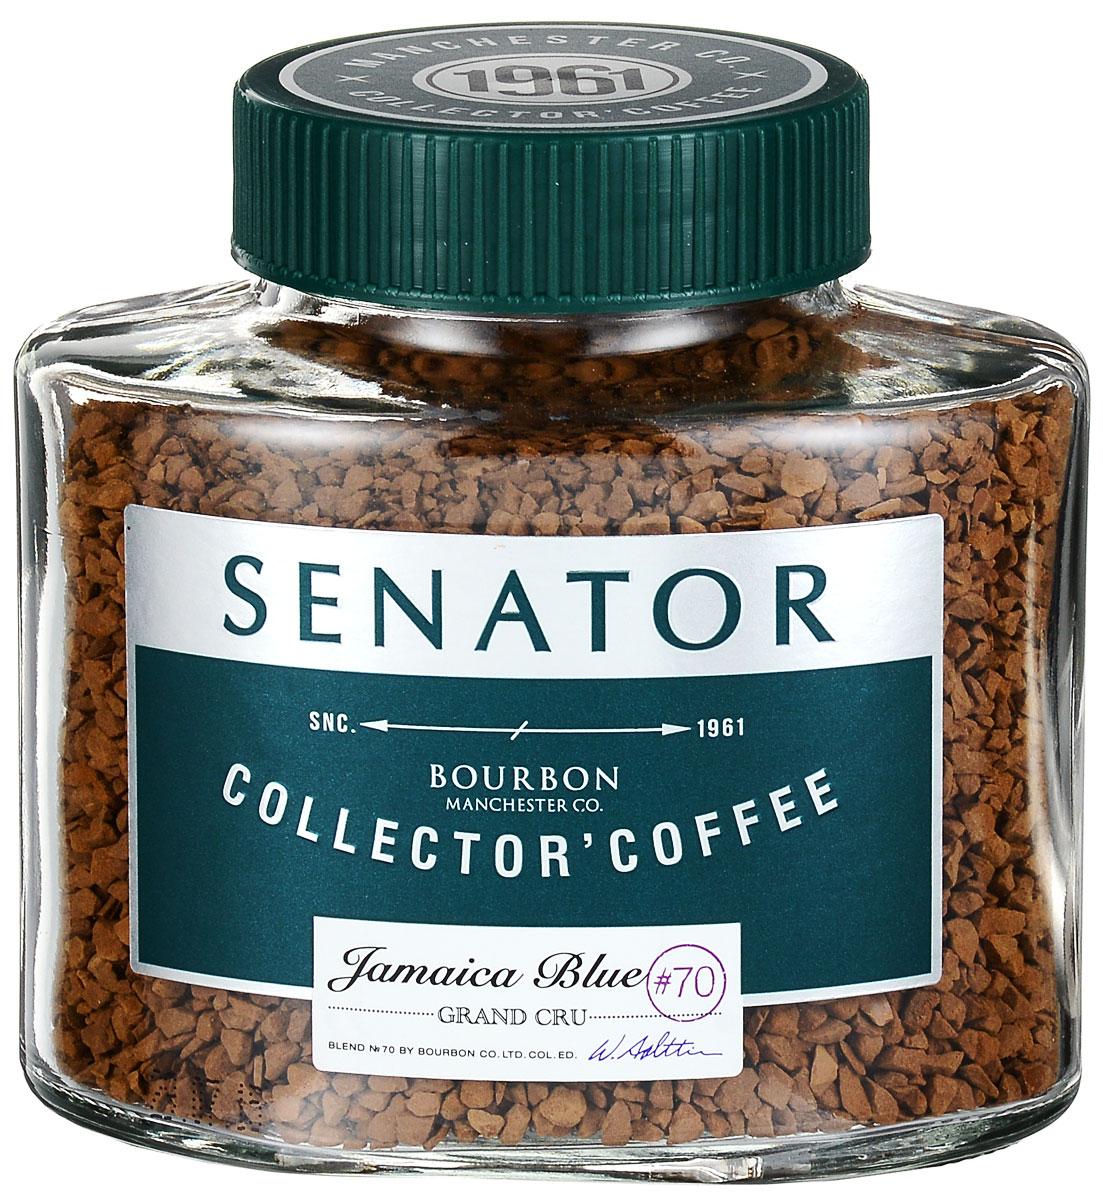 Senator Jamaica Blue кофе растворимый, 90 г senator barista кофе растворимый 100 г